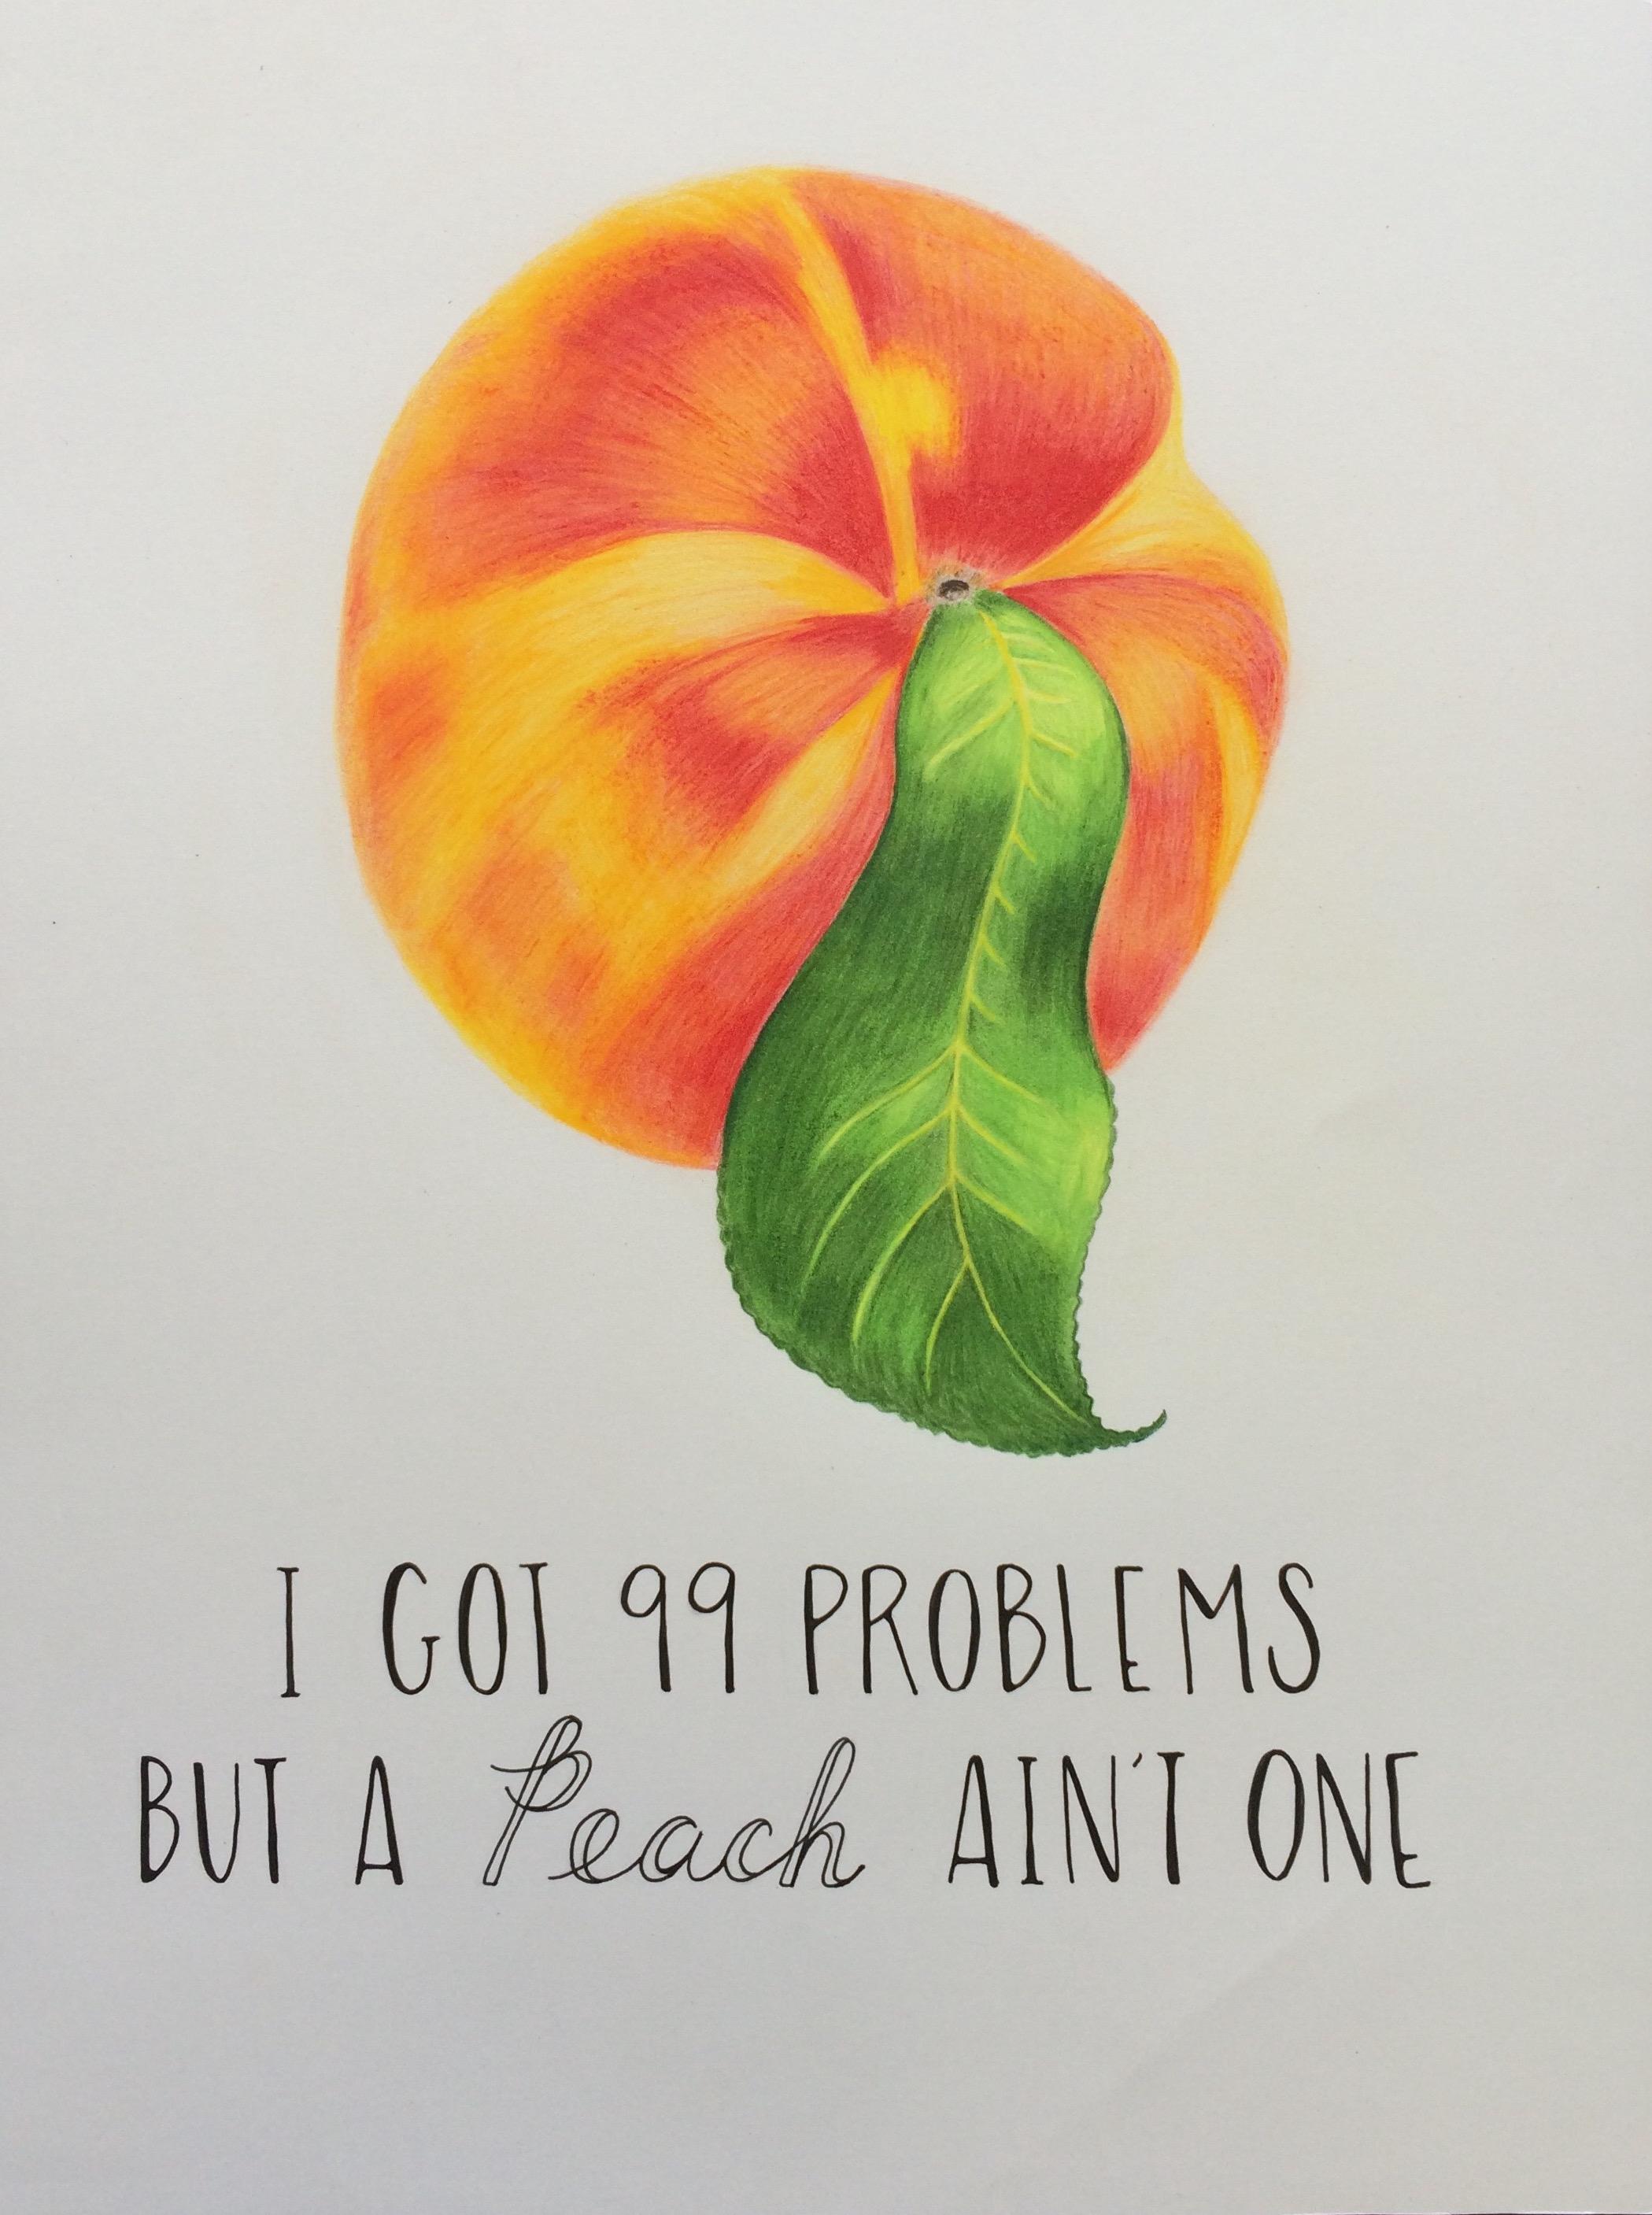 I Got 99 Problems But A Peach Ain't One